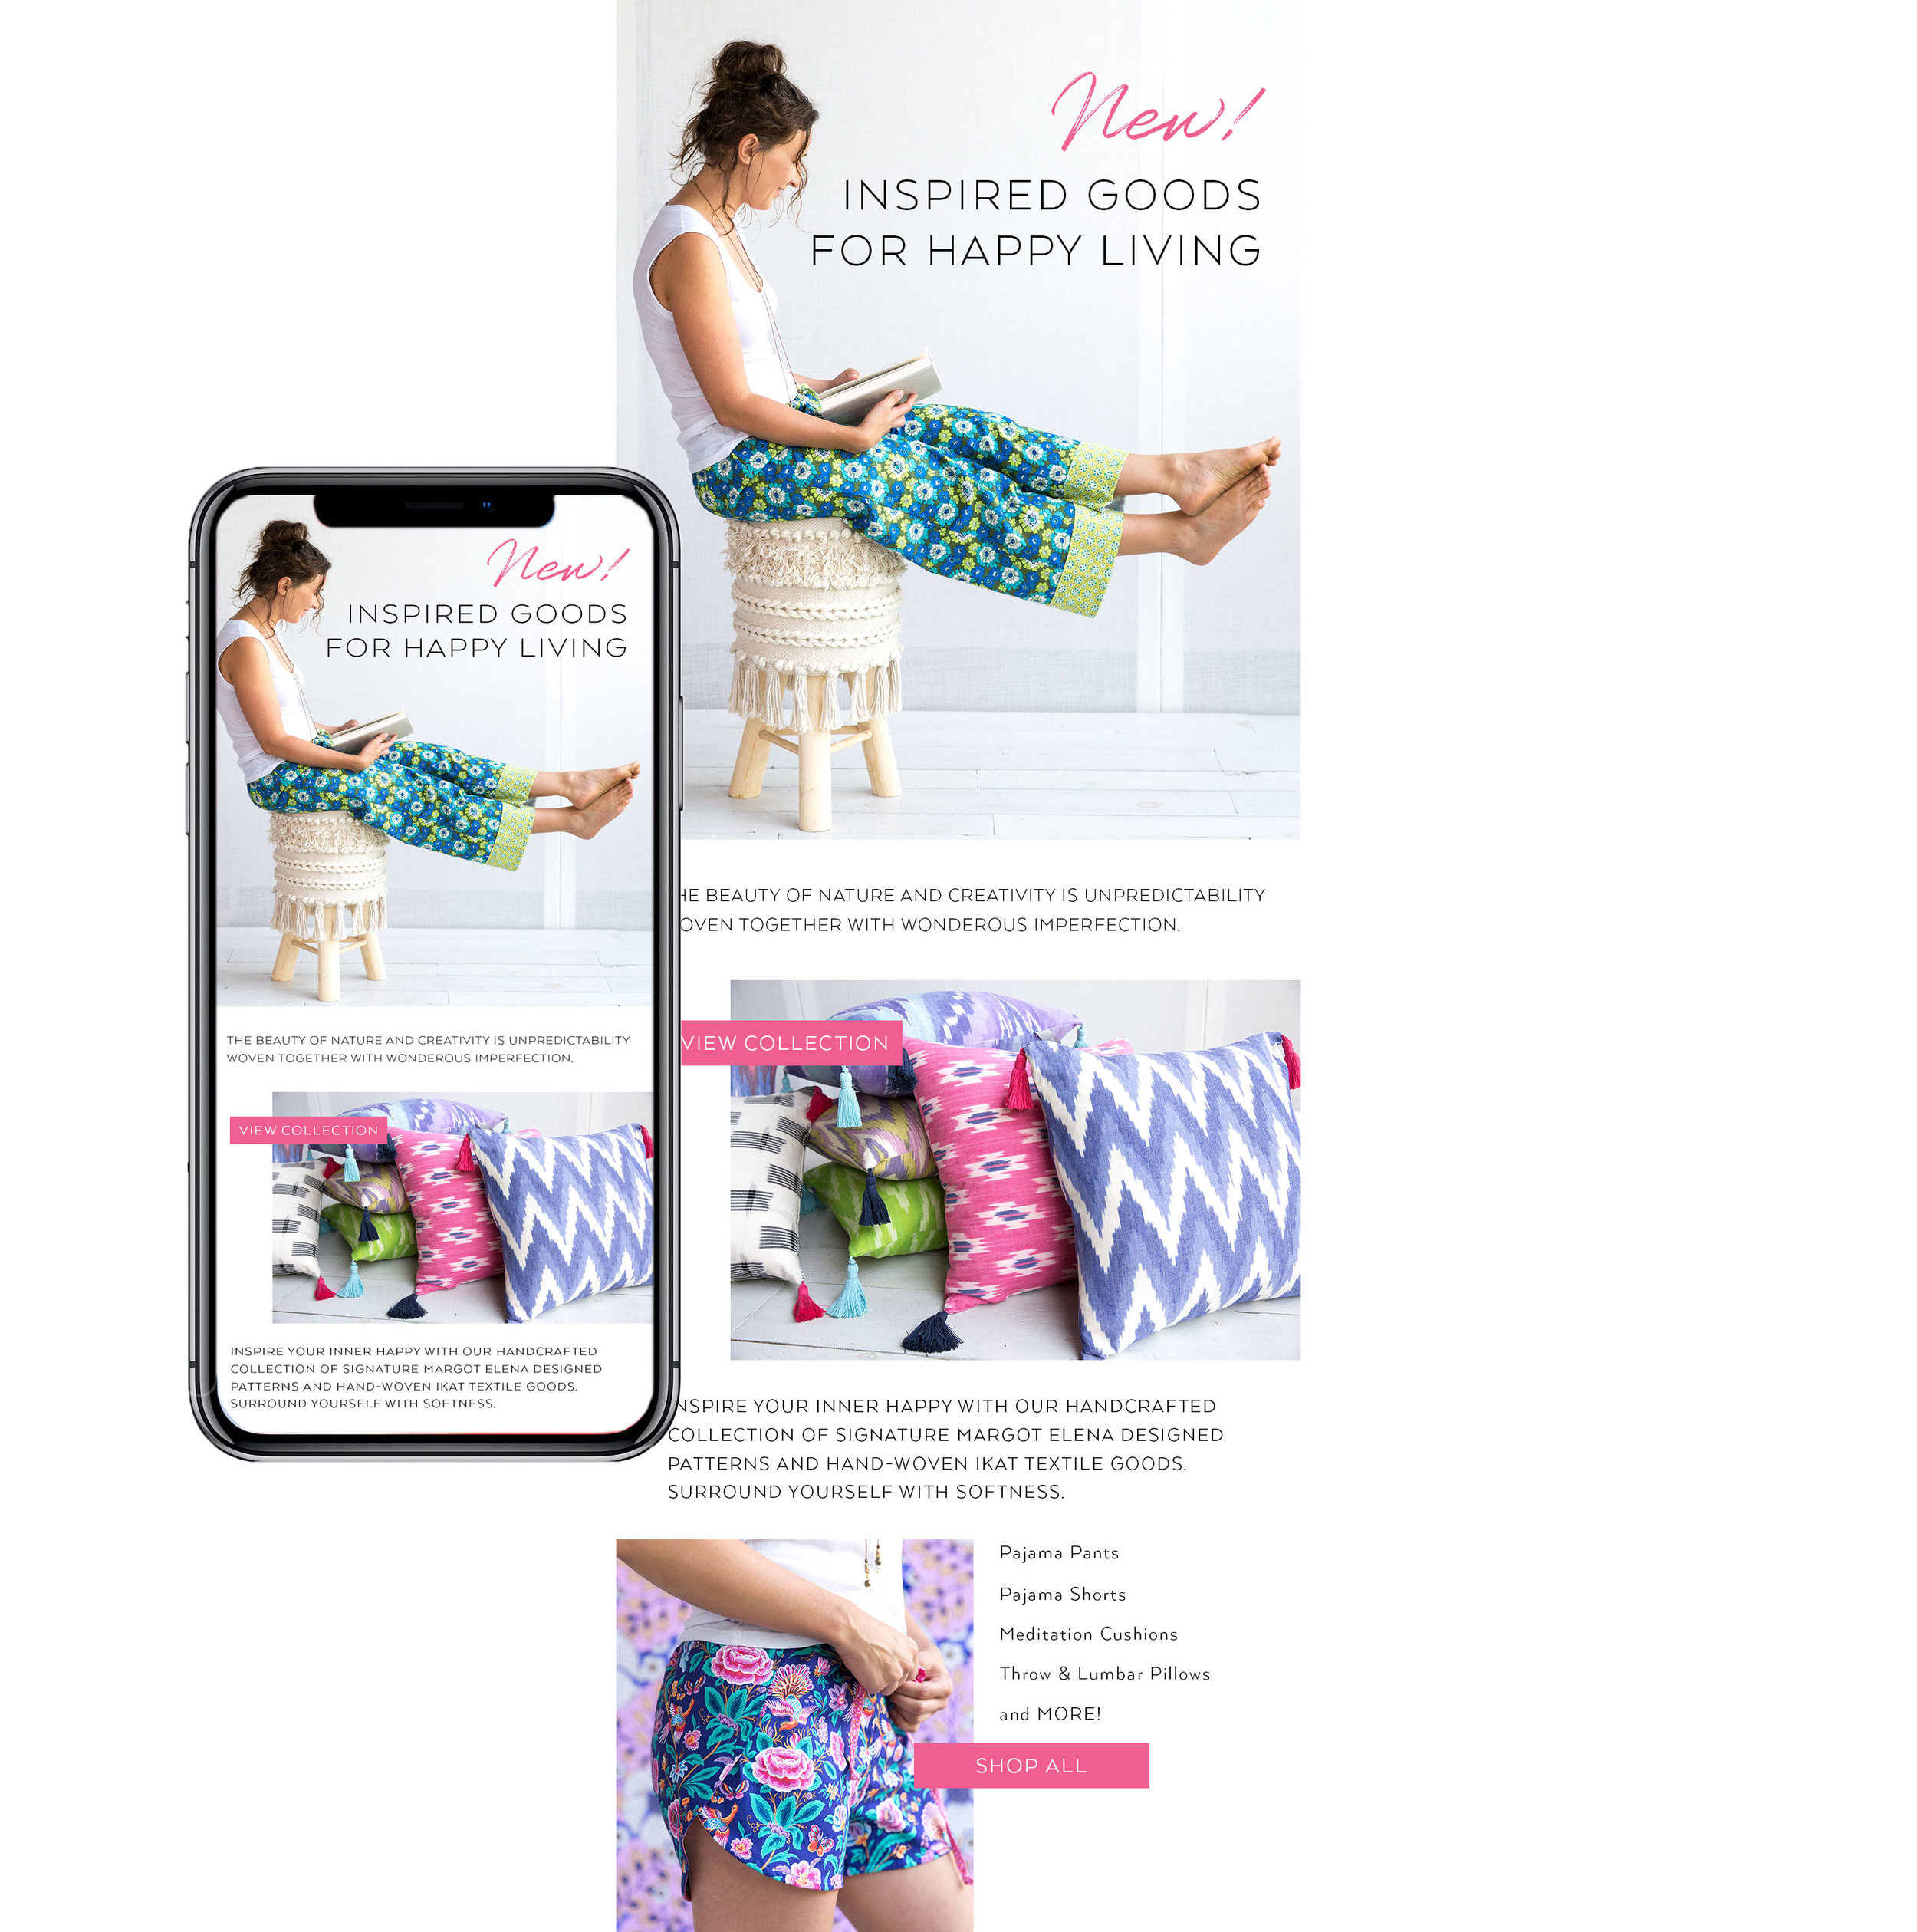 LOF_Pajama-Launch_combo.jpg